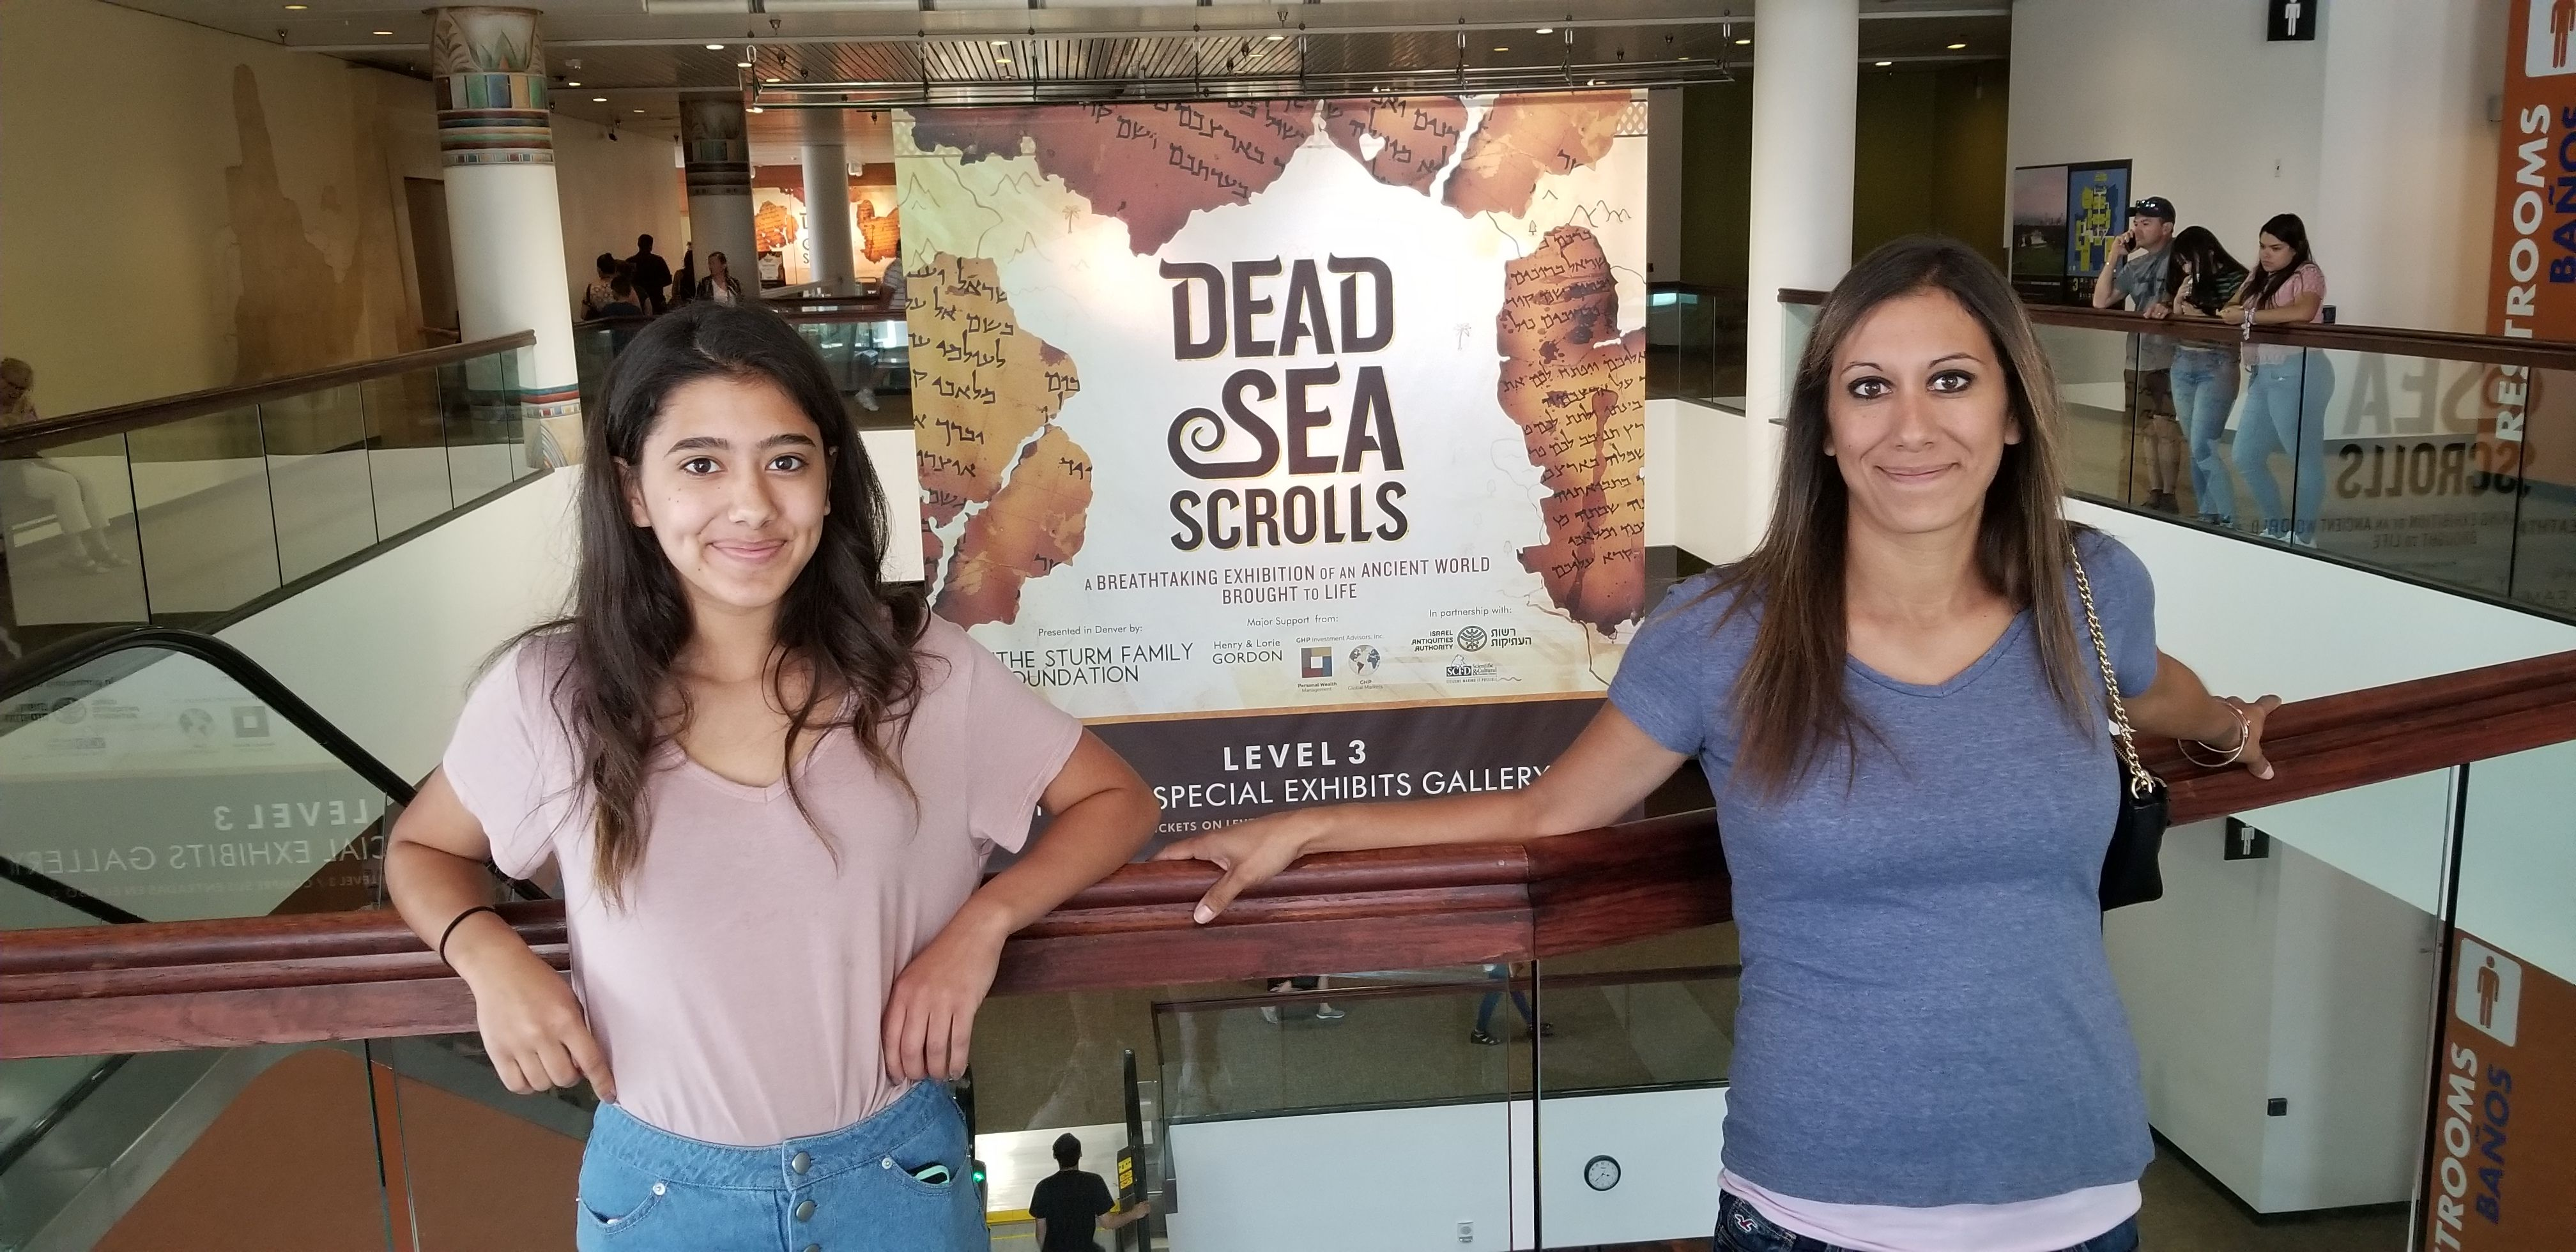 dead sea scrolls denver